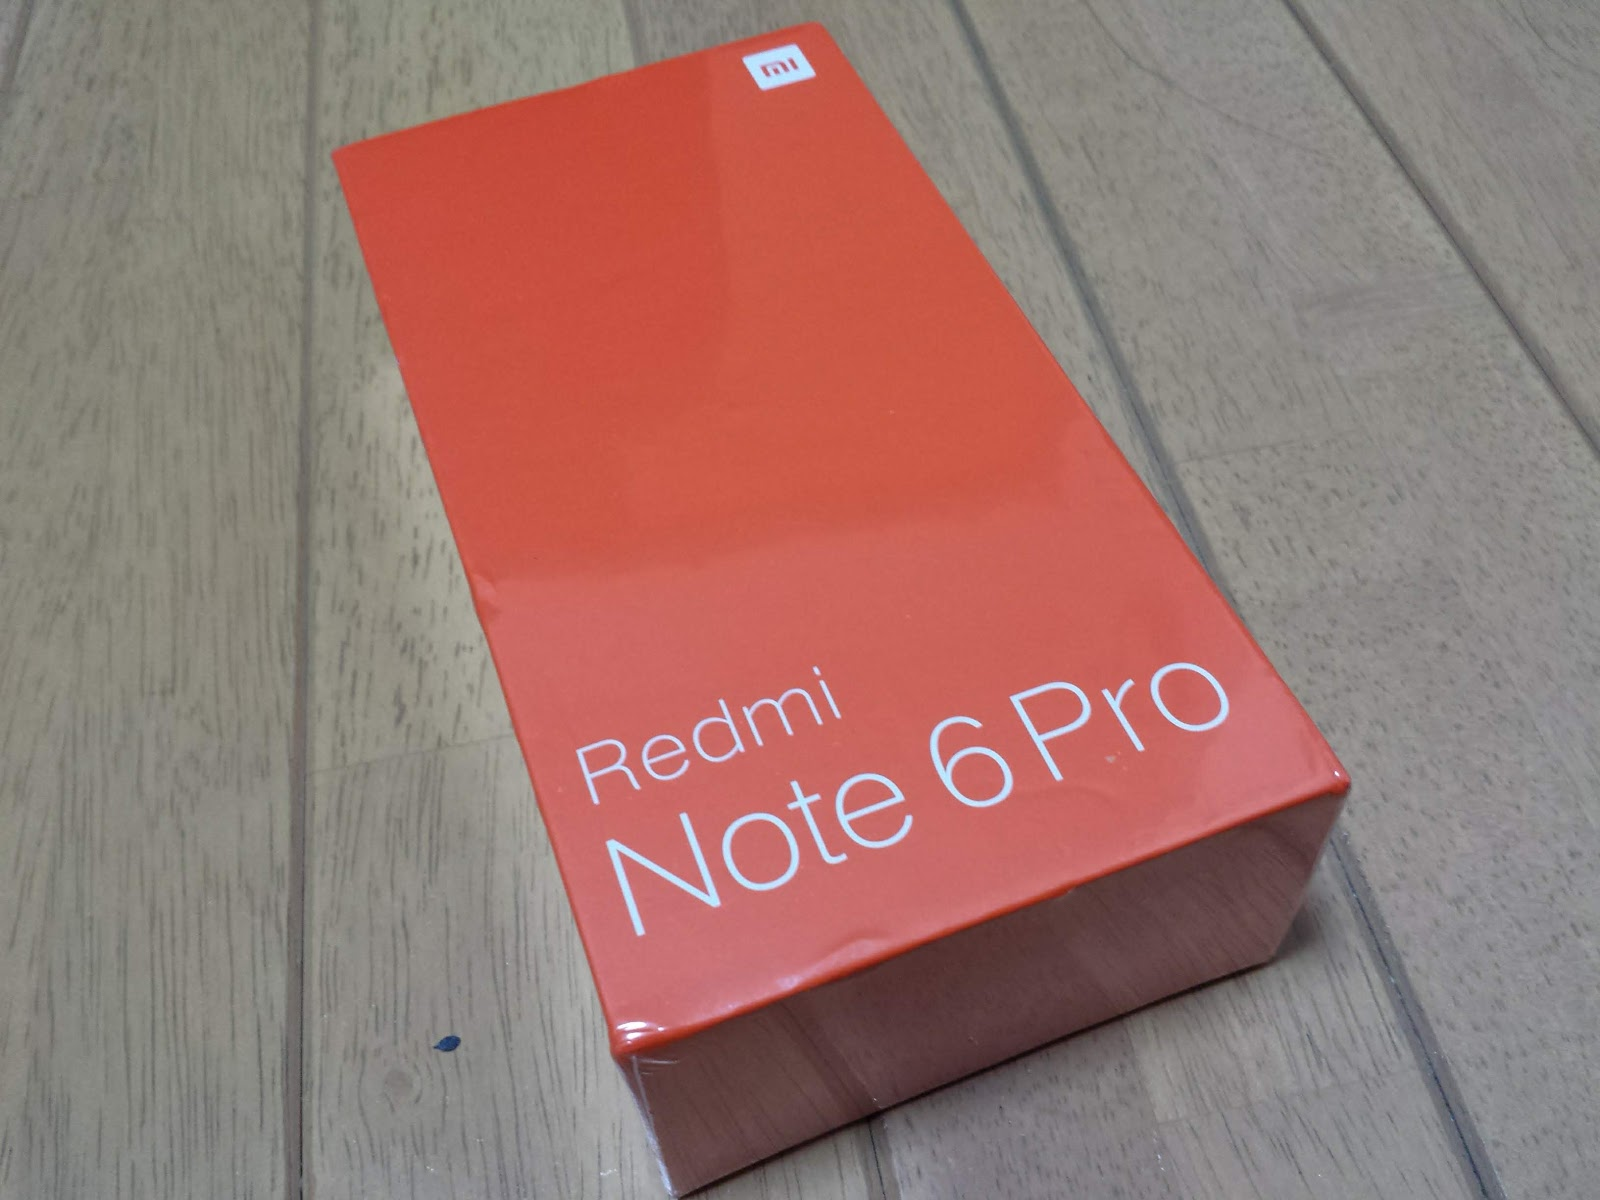 xiaomi redmi note 6 proが着弾